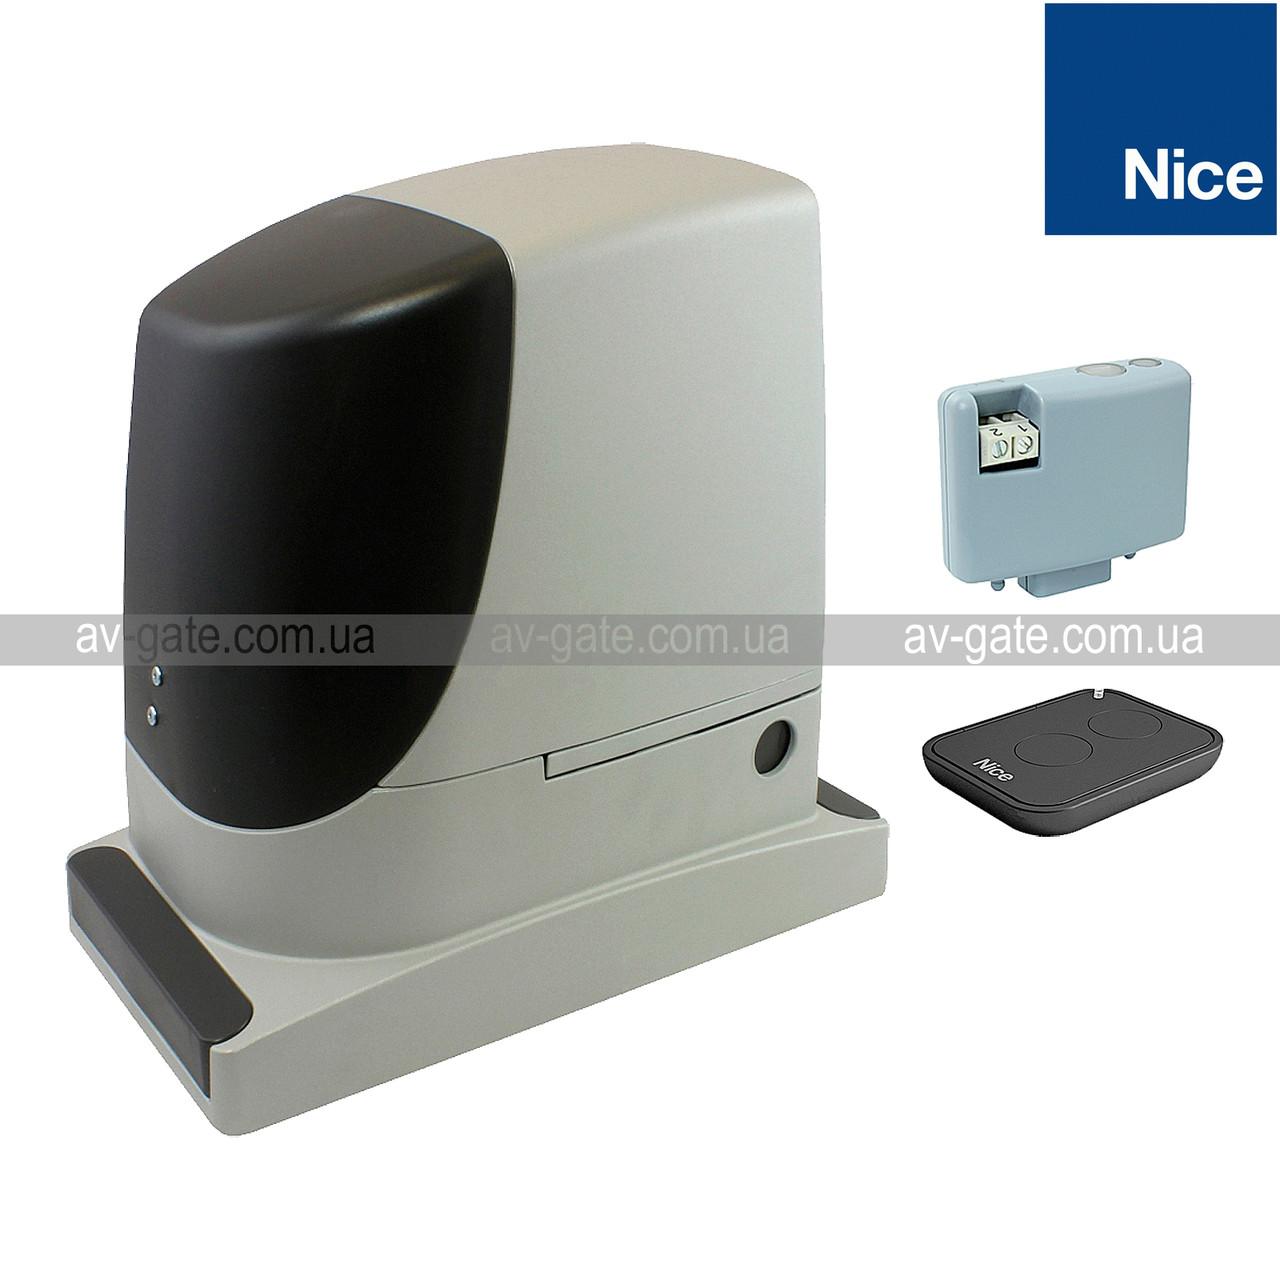 Комплект автоматики RUN2500KCE Nice для откатных ворот (ширина до 18 м)